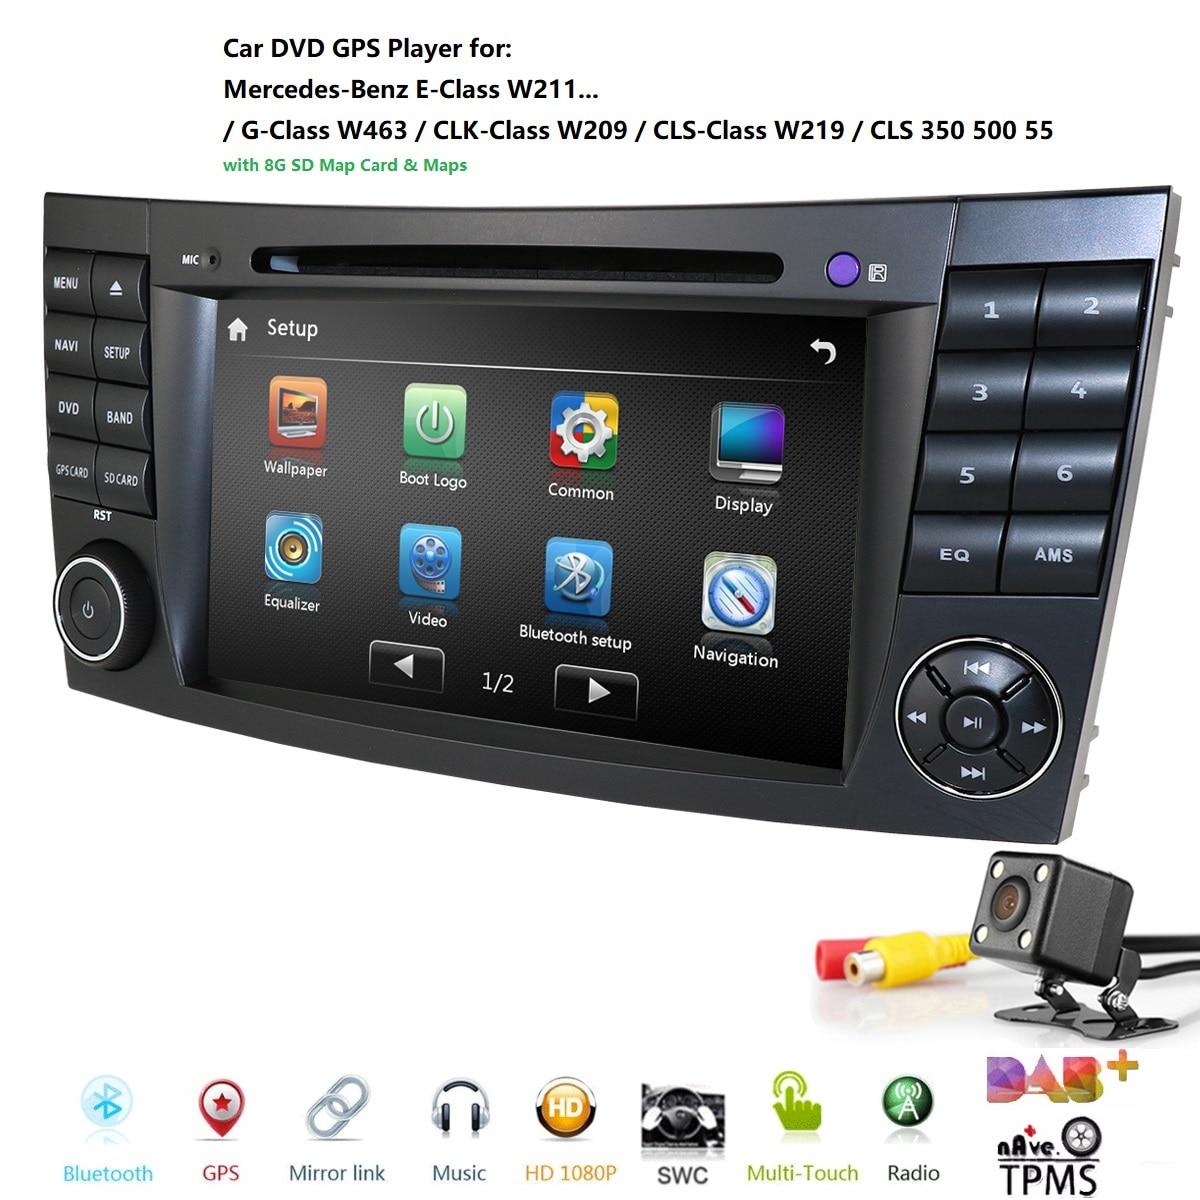 2 דין רכב נגן DVD עבור מרצדס בנץ e-class W211 E200 E220 E300 E350 E240 E270 E280 CLS כיתת W219 CANBUS SD רדיו AM/FM DTVB